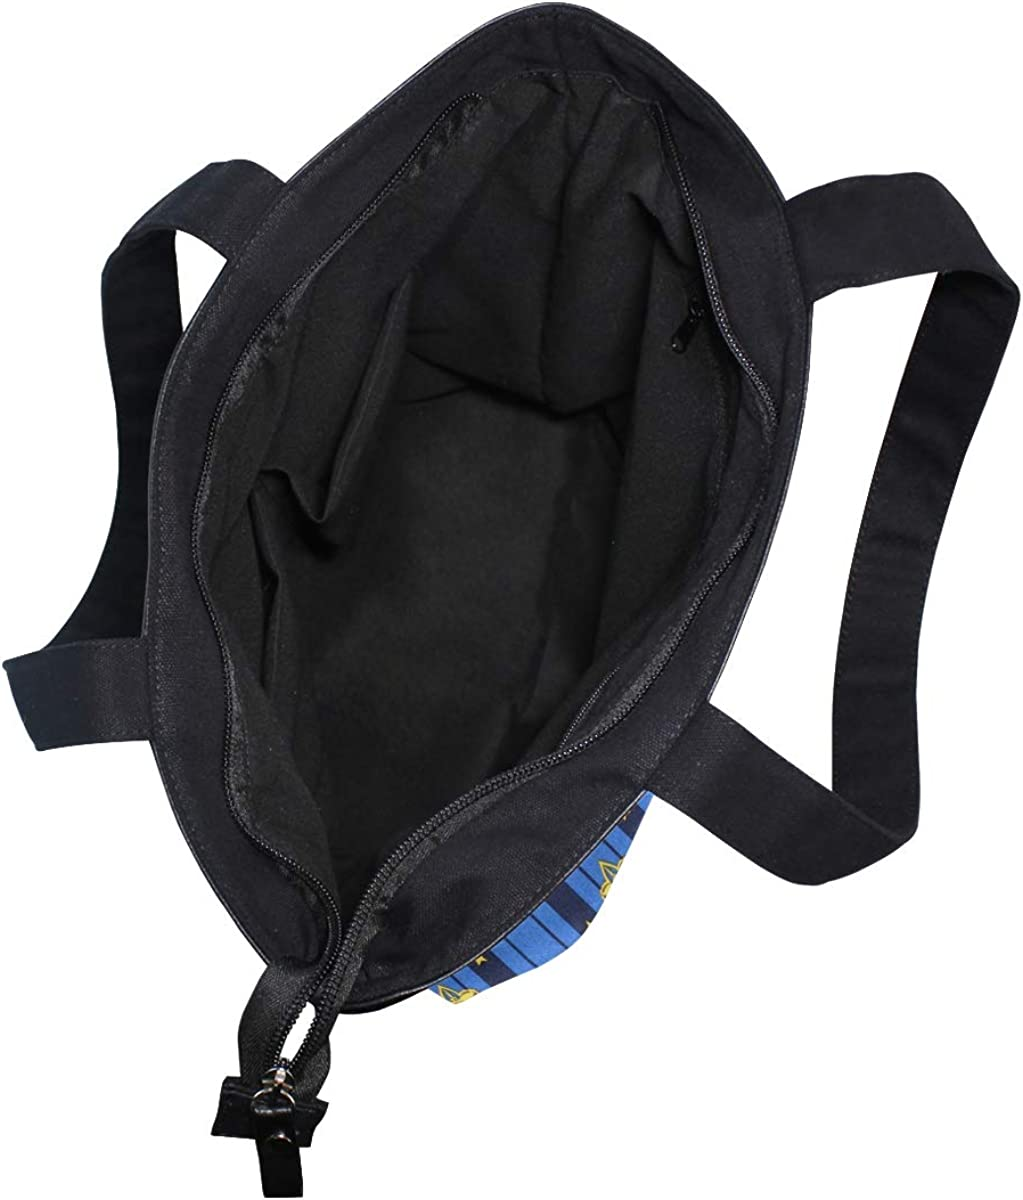 Women Large Tote Top Handle Shoulder Bags Robert Kaufman Registered Boy Scout 1 Satchel Handbag